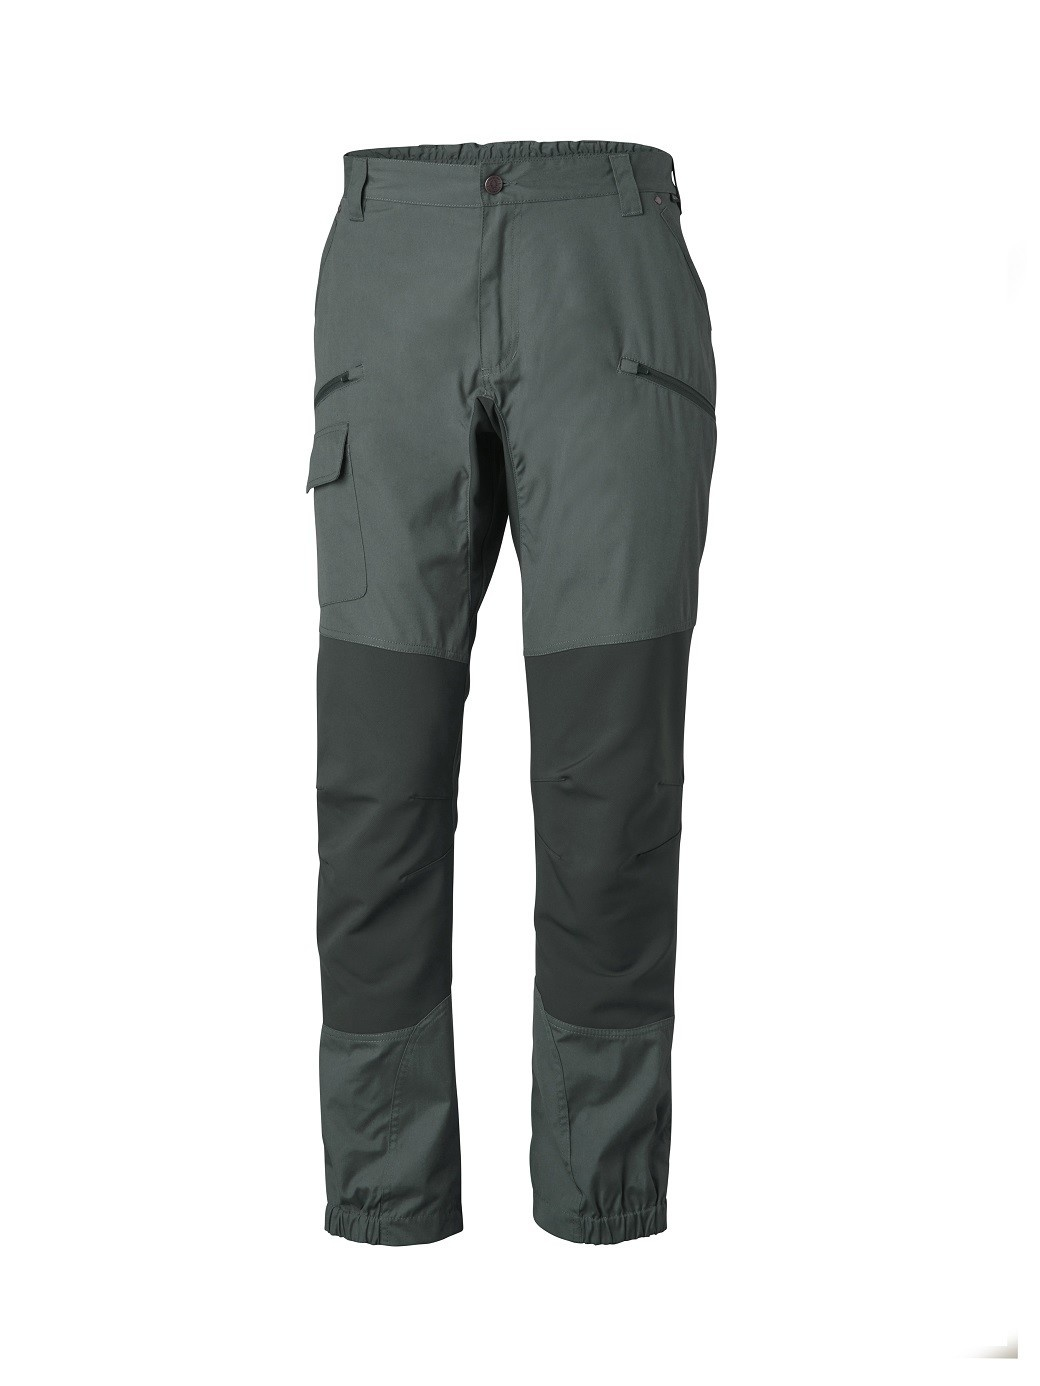 Chevalier Belston Pant Grey-1